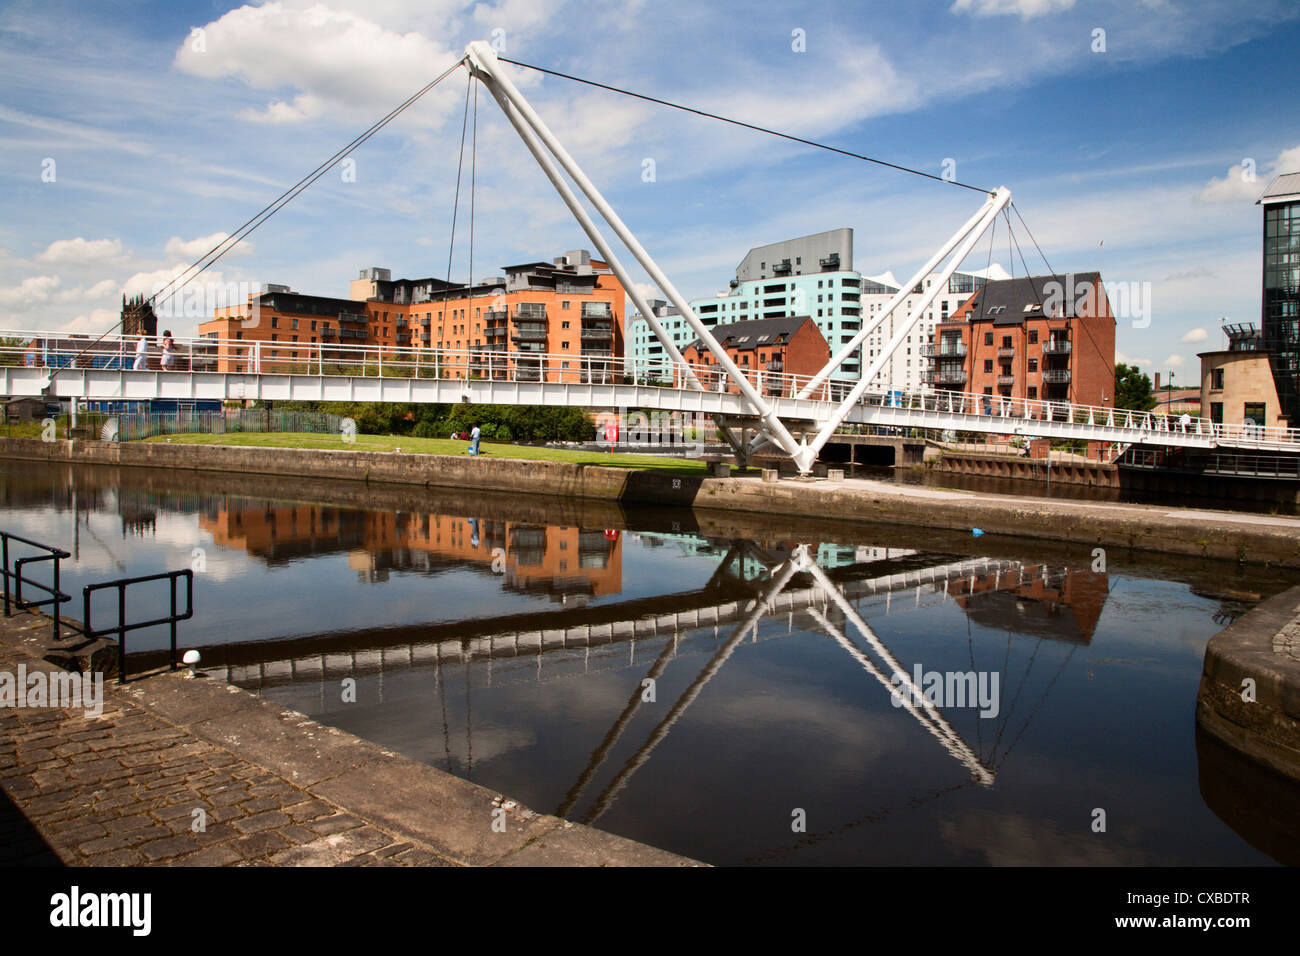 Knights Way Bridge at Leeds Lock No 1, Leeds, West Yorkshire, Yorkshire, England, United Kingdom, Europe - Stock Image